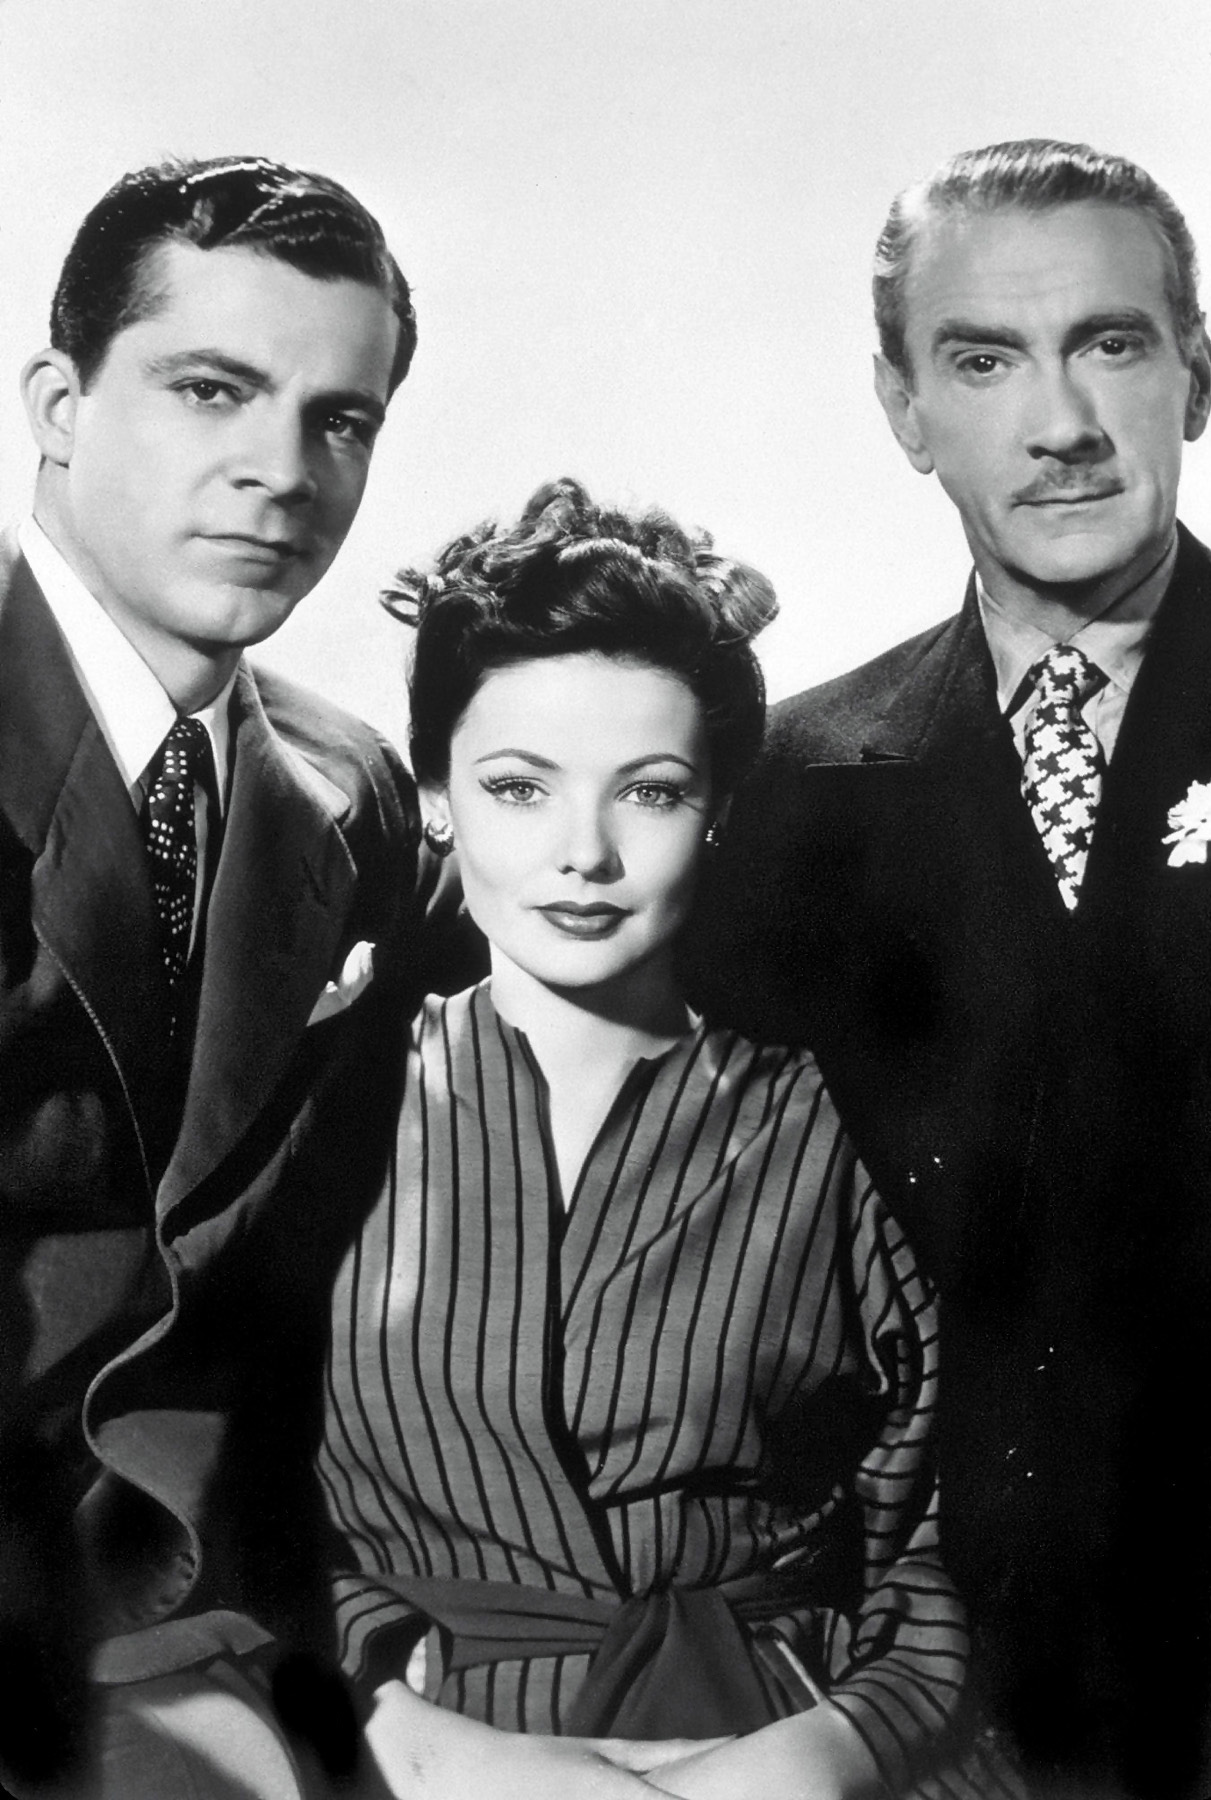 (L to R) Dana Andrews, Gene Tierney, Clifton Webb